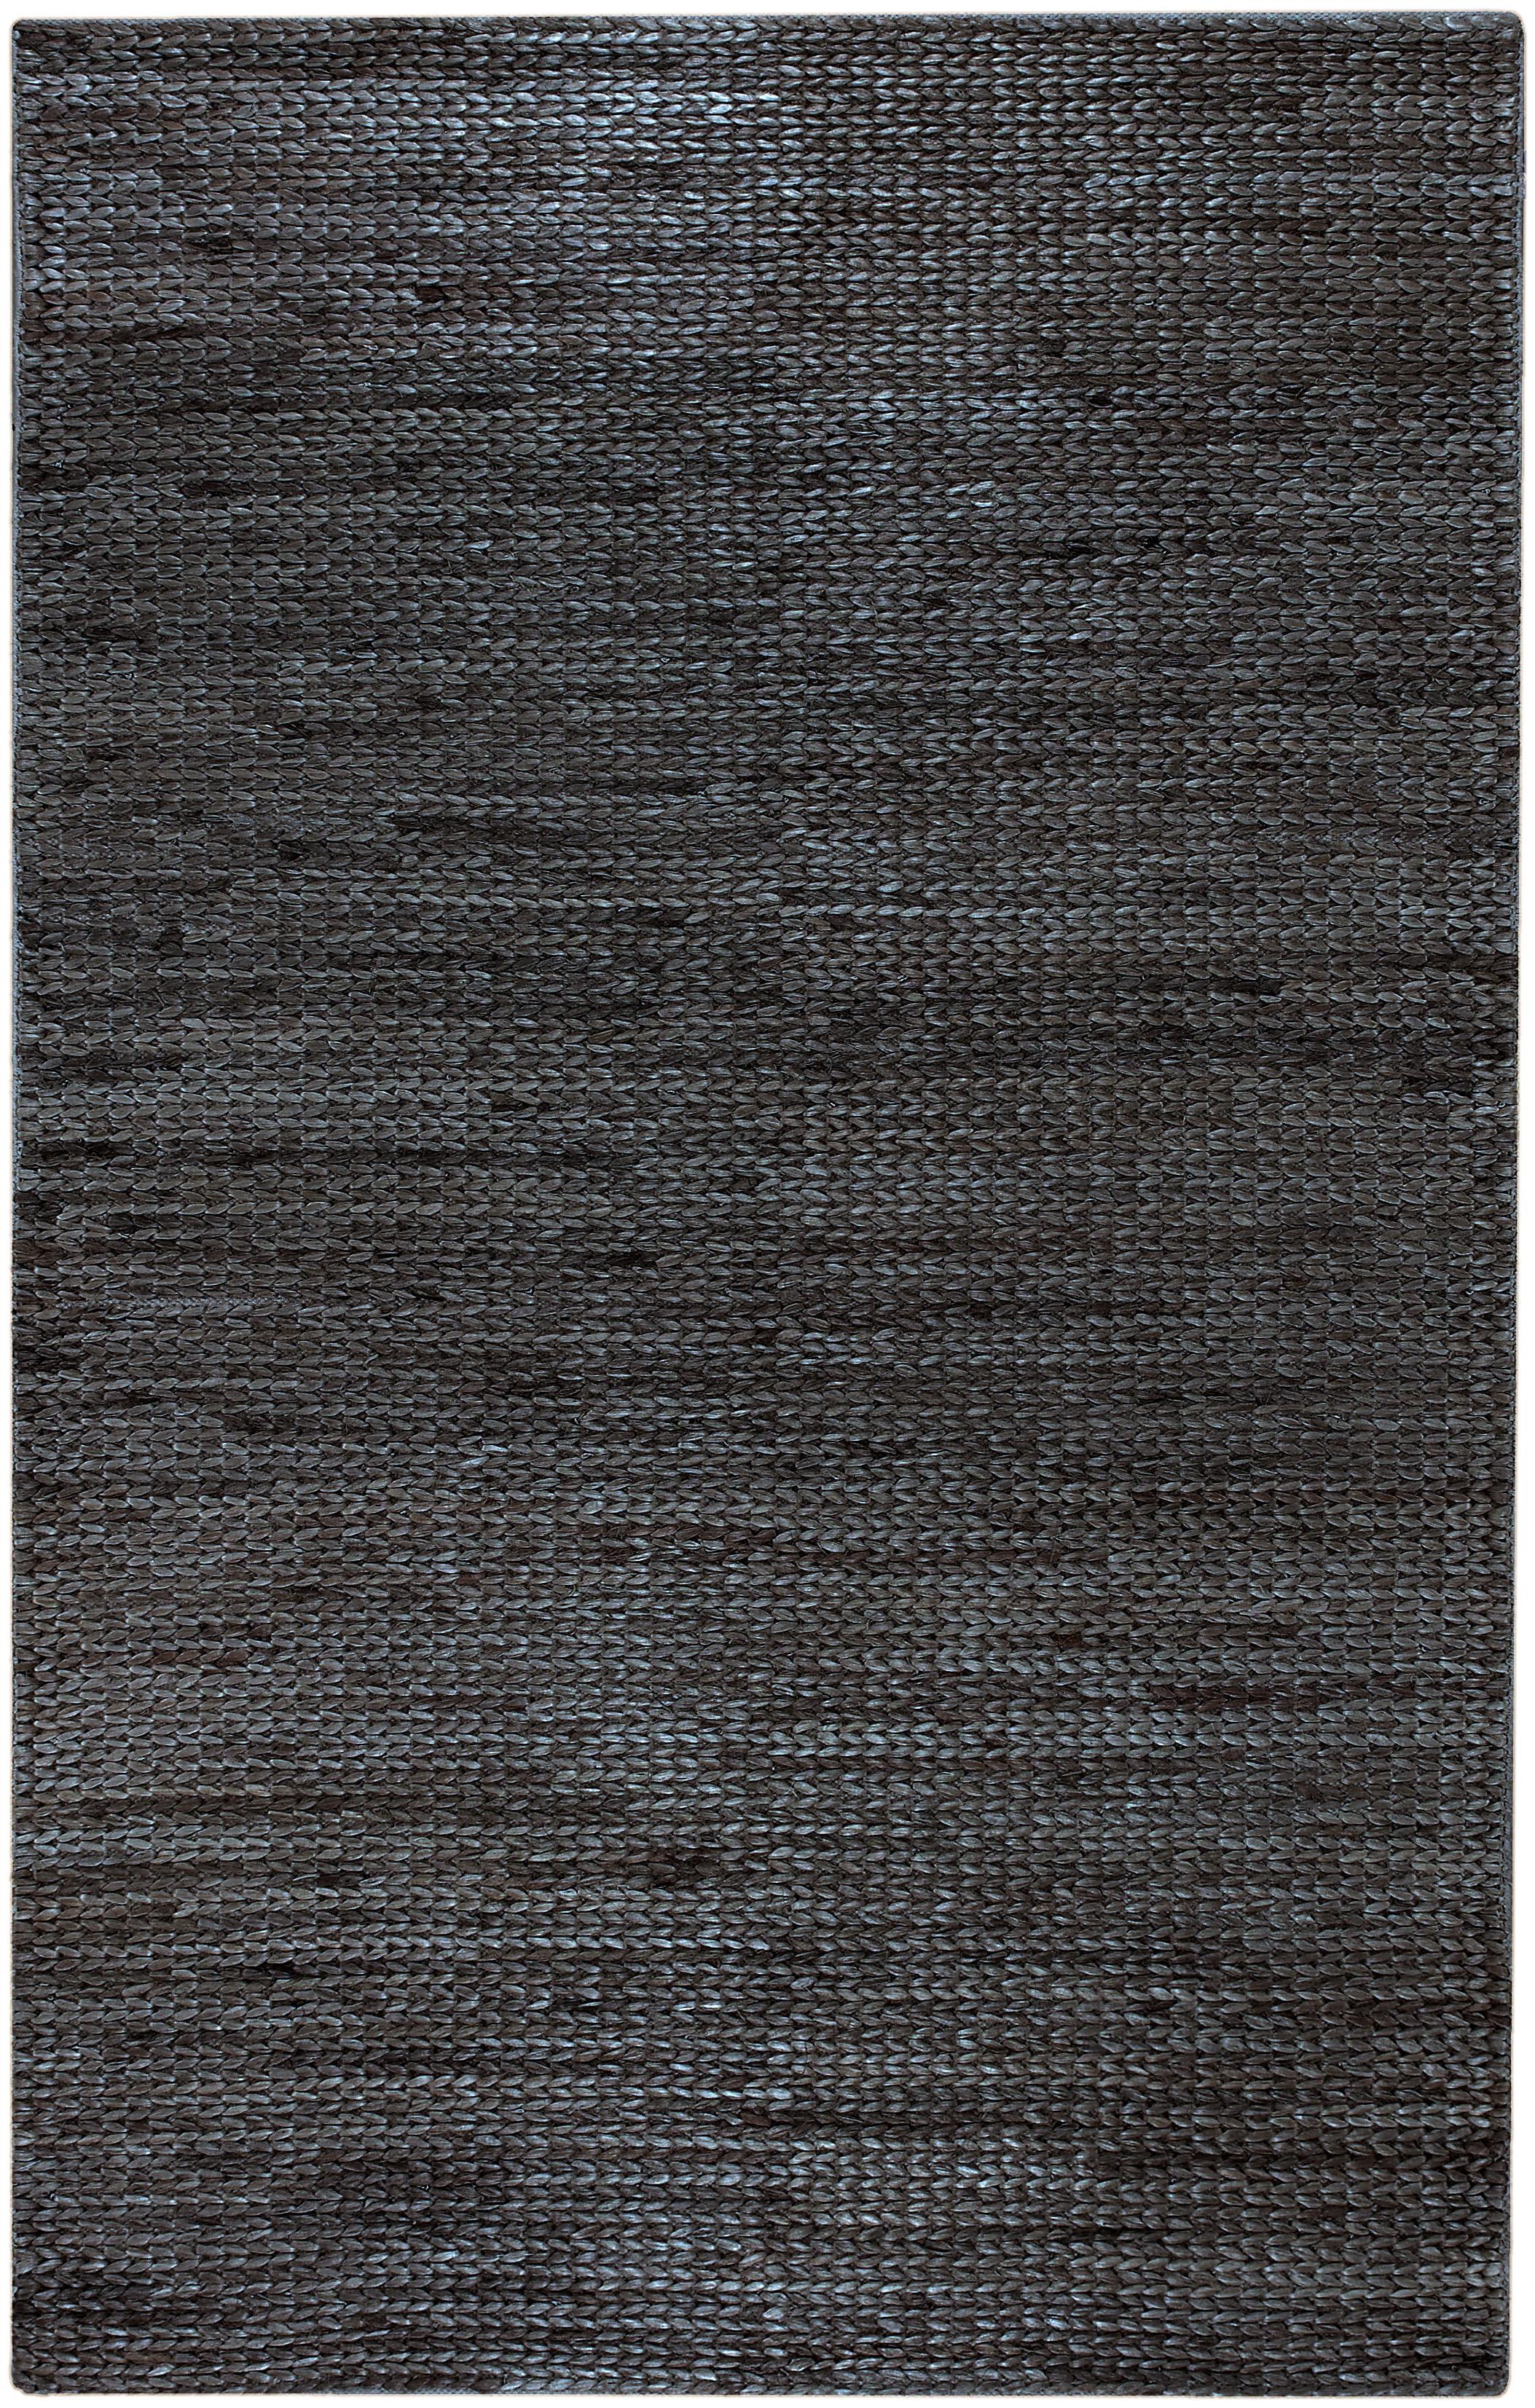 Surya Rugs Tropics 5' x 8' - Item Number: TRO1024-58